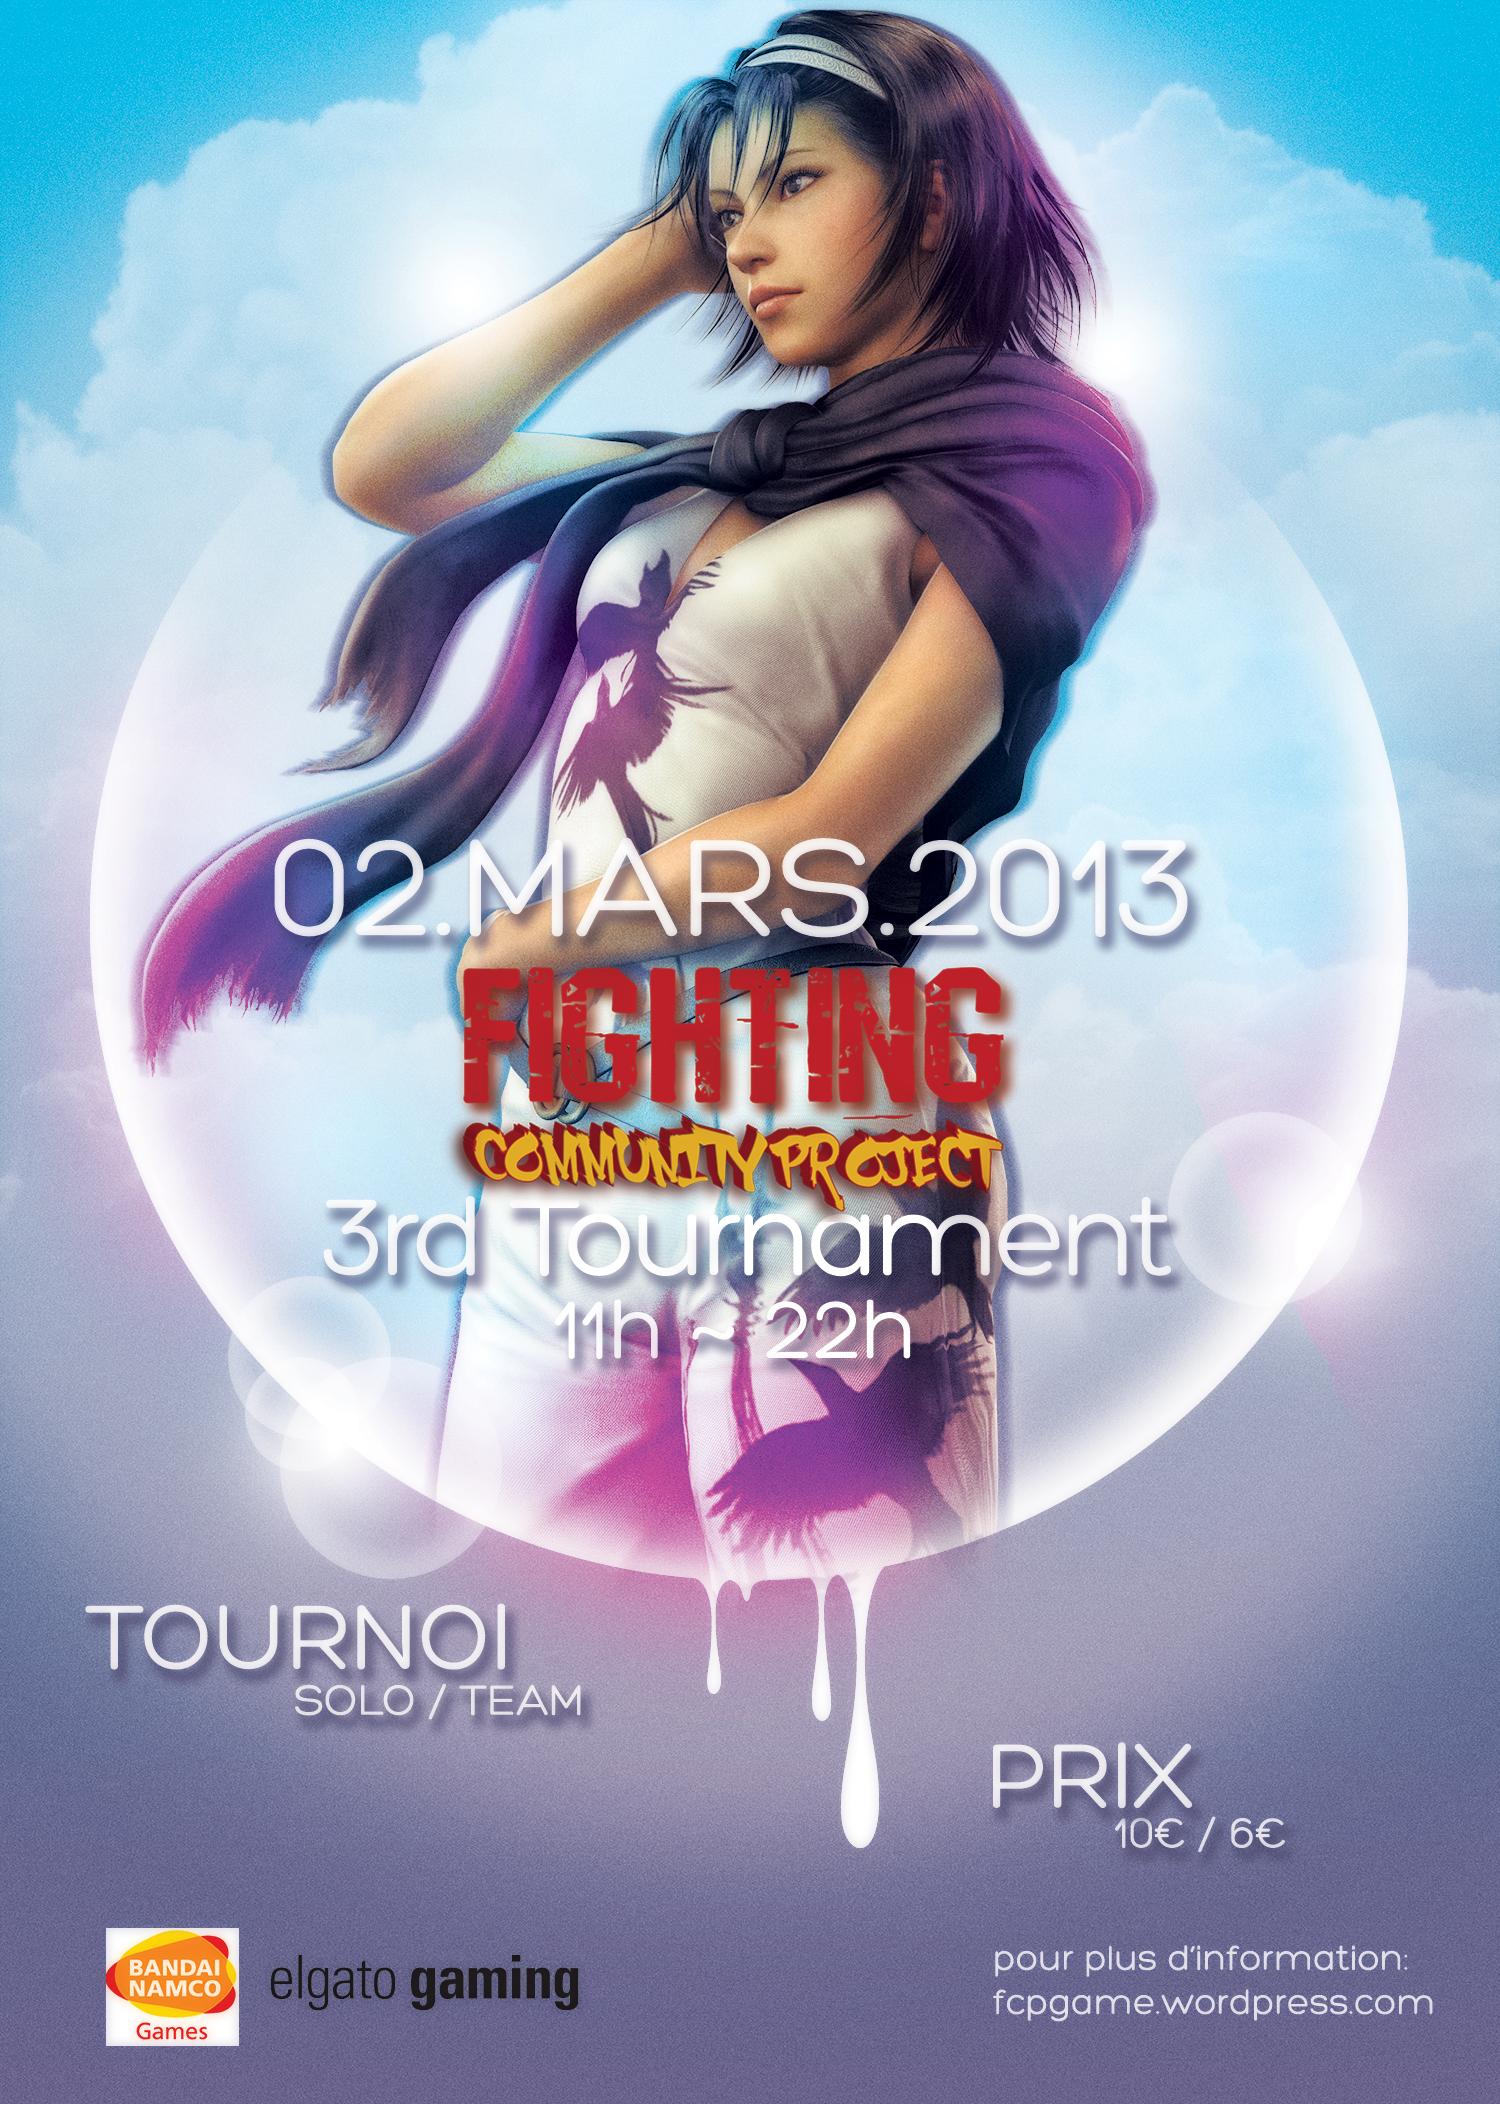 Fighting Community Project #3, [02/03/2013,Paris]